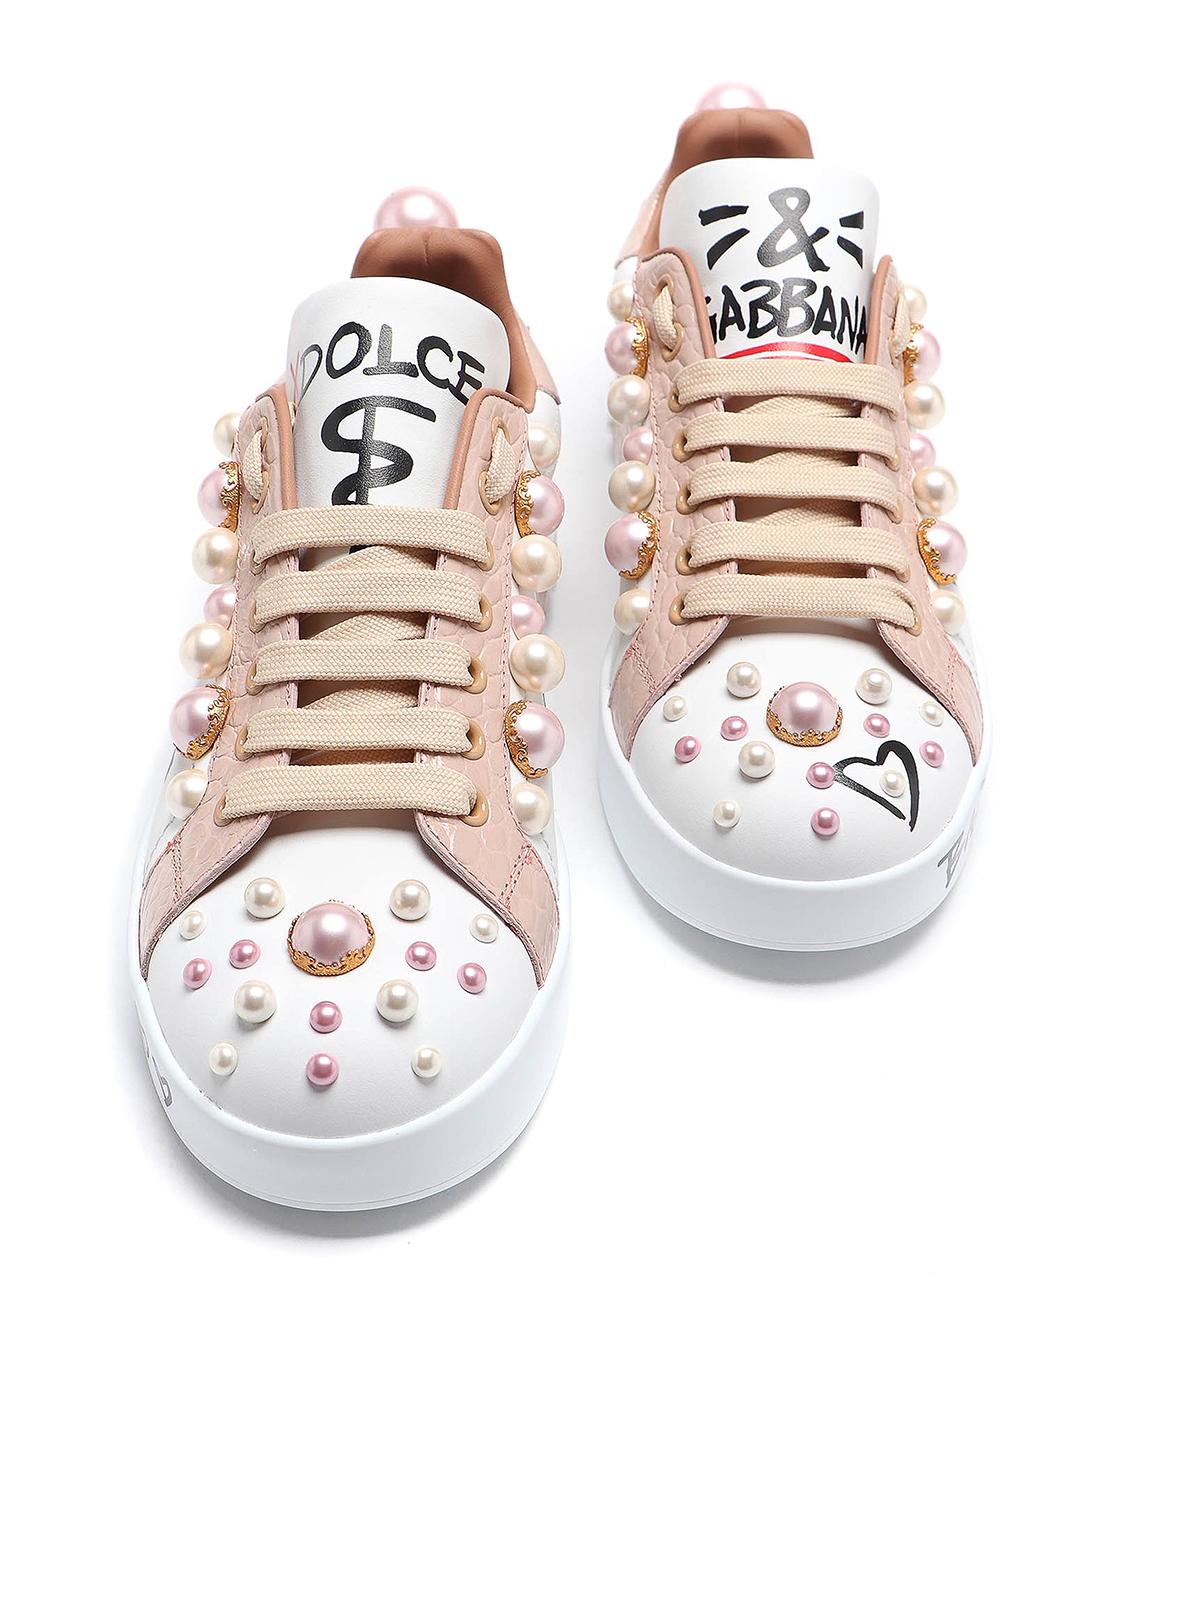 Dolce \u0026 Gabbana - Portofino sneakers